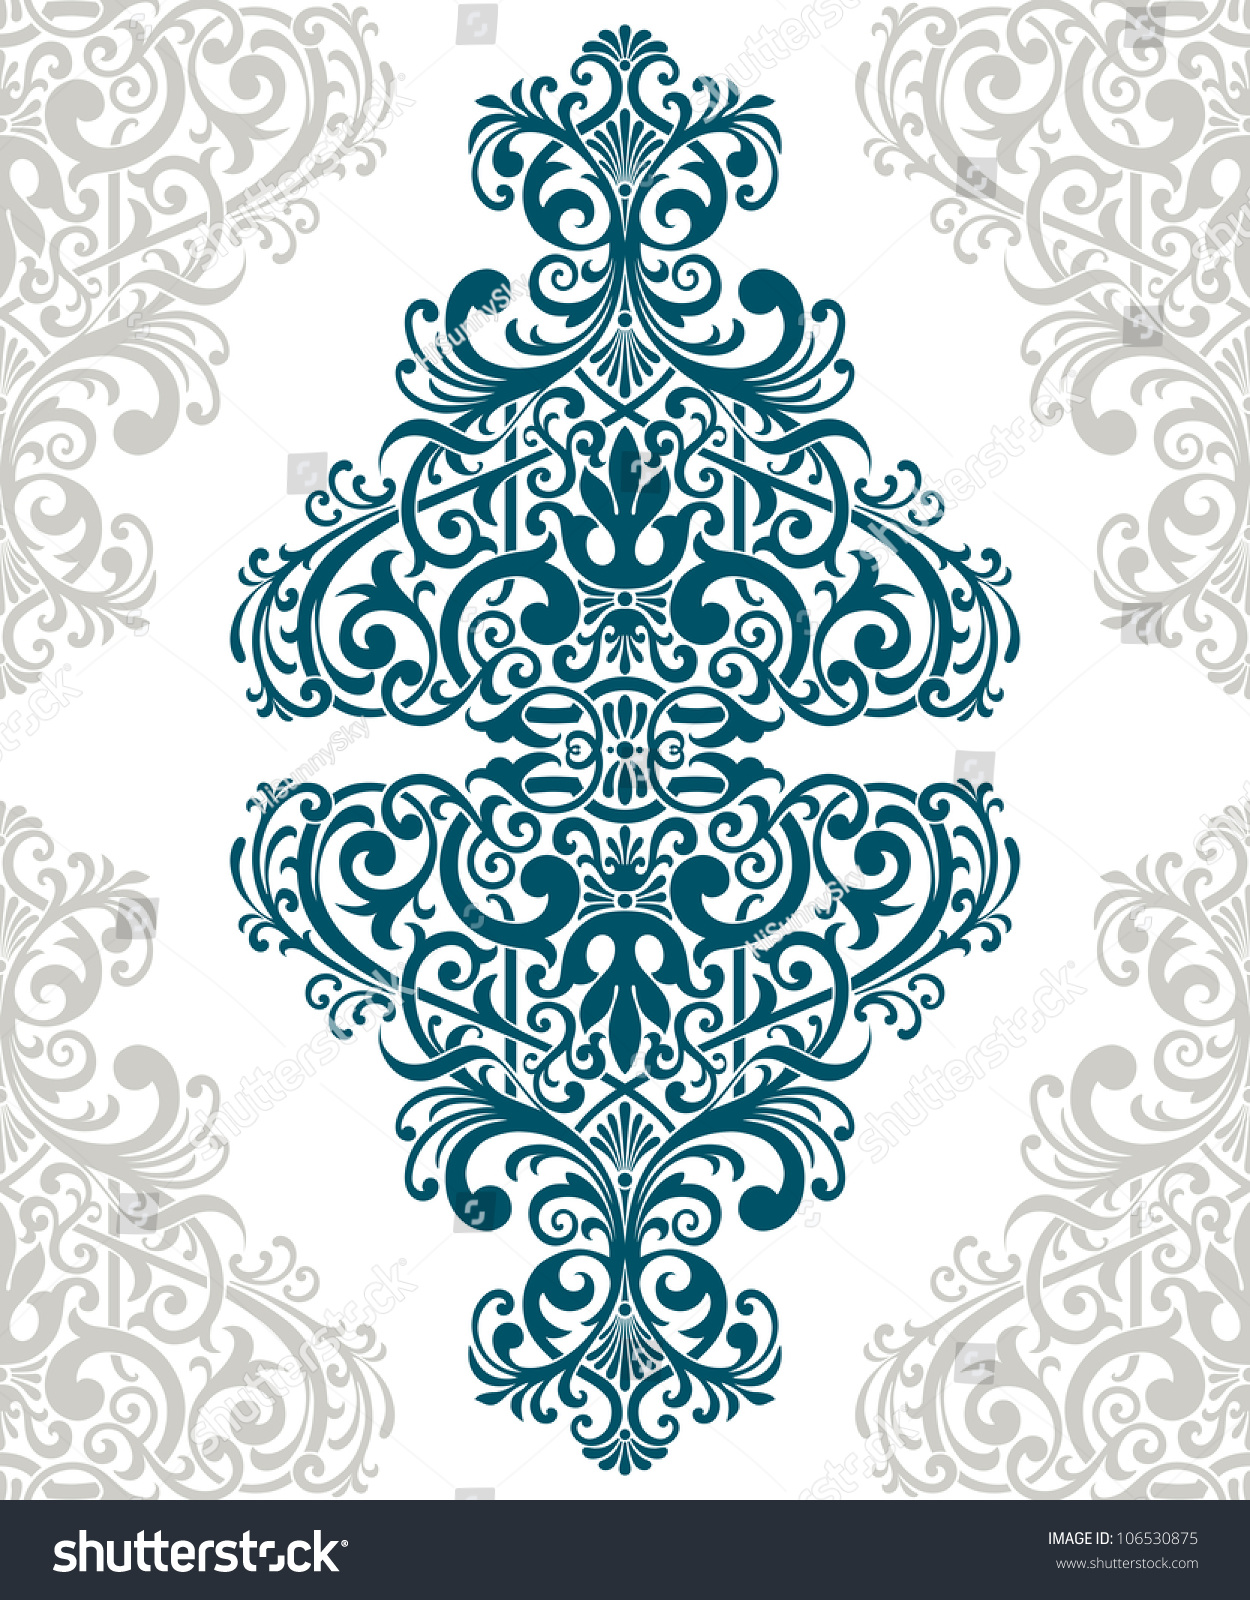 Simple Wedding Invitation Card Designs with perfect invitation design